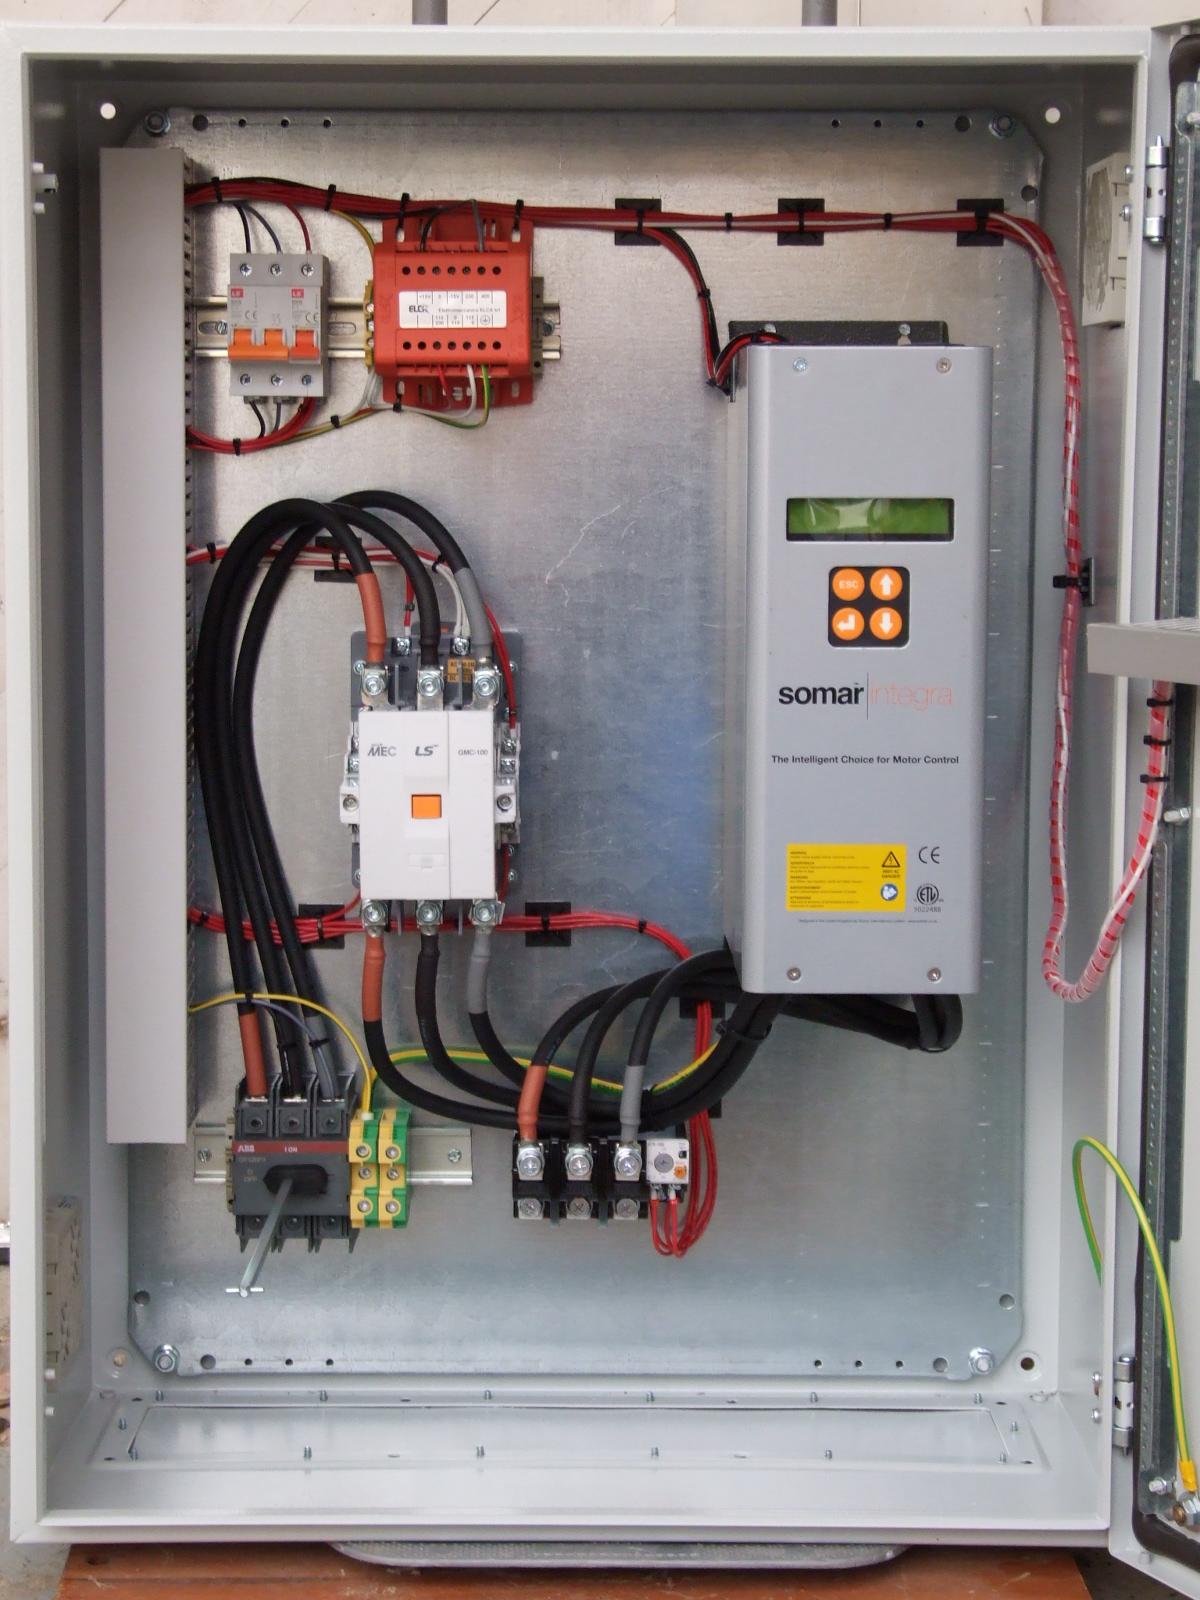 soft starter wiring diagram schneider acid rain cycle regler engineering business solutions product